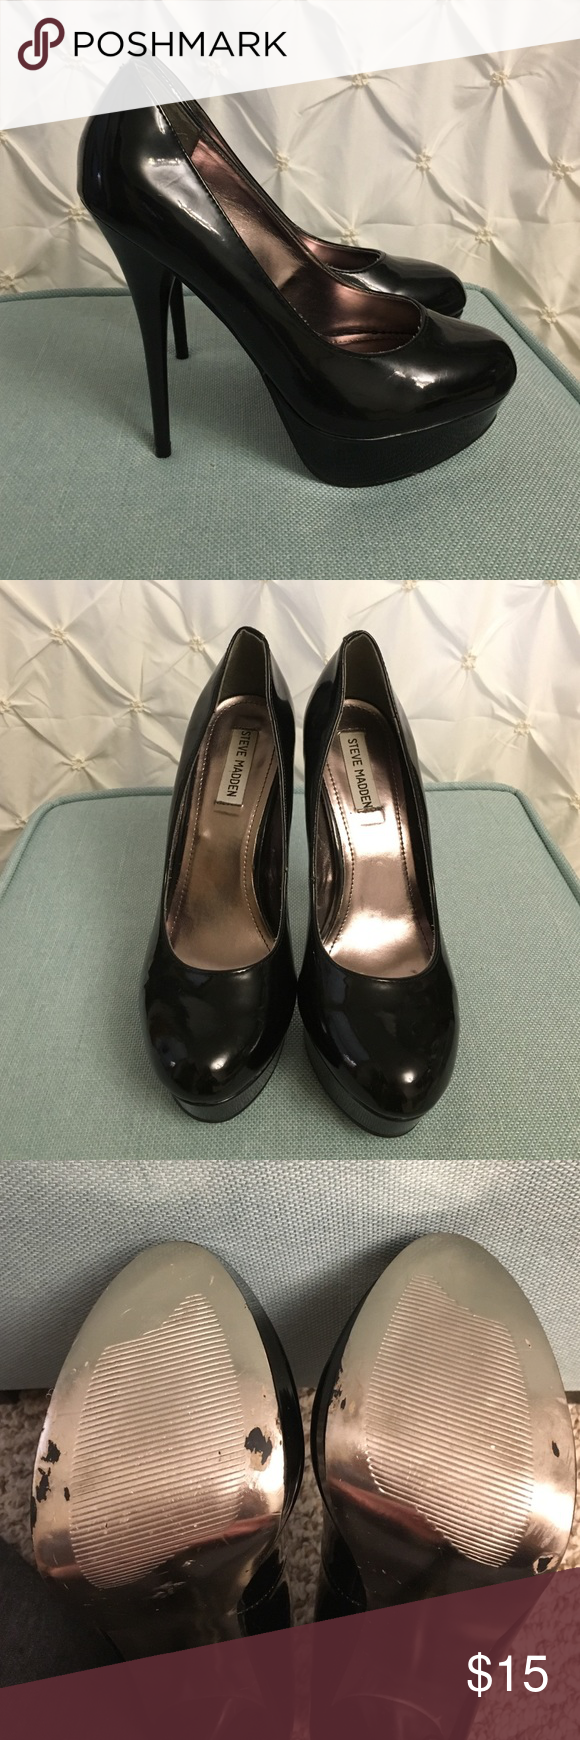 "Steve Madden Heels Black platform heels. 5.5"" heel. Platform ~1.5"". White scuff on left toe. Steve Madden Shoes Heels"